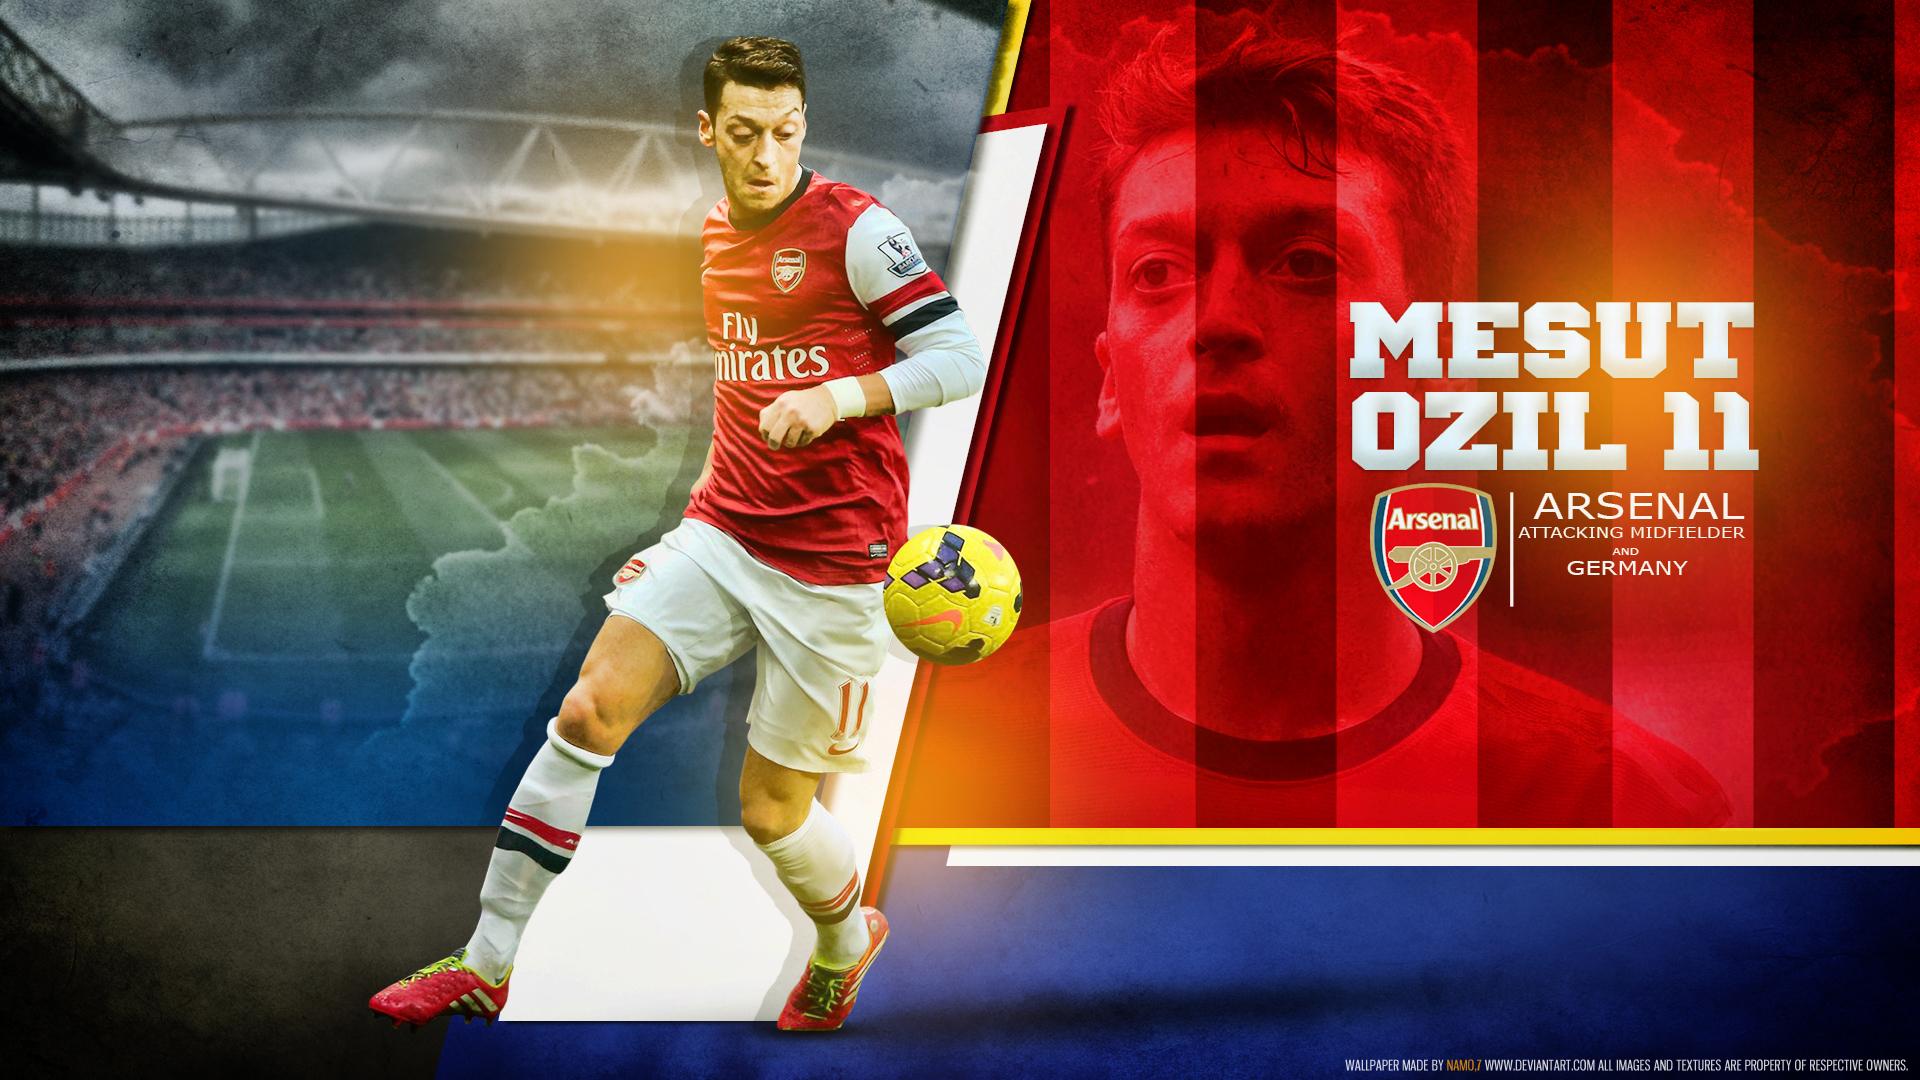 Mesut Ozil 11 Arsenal By Namo,7 By 445578gfx On DeviantArt